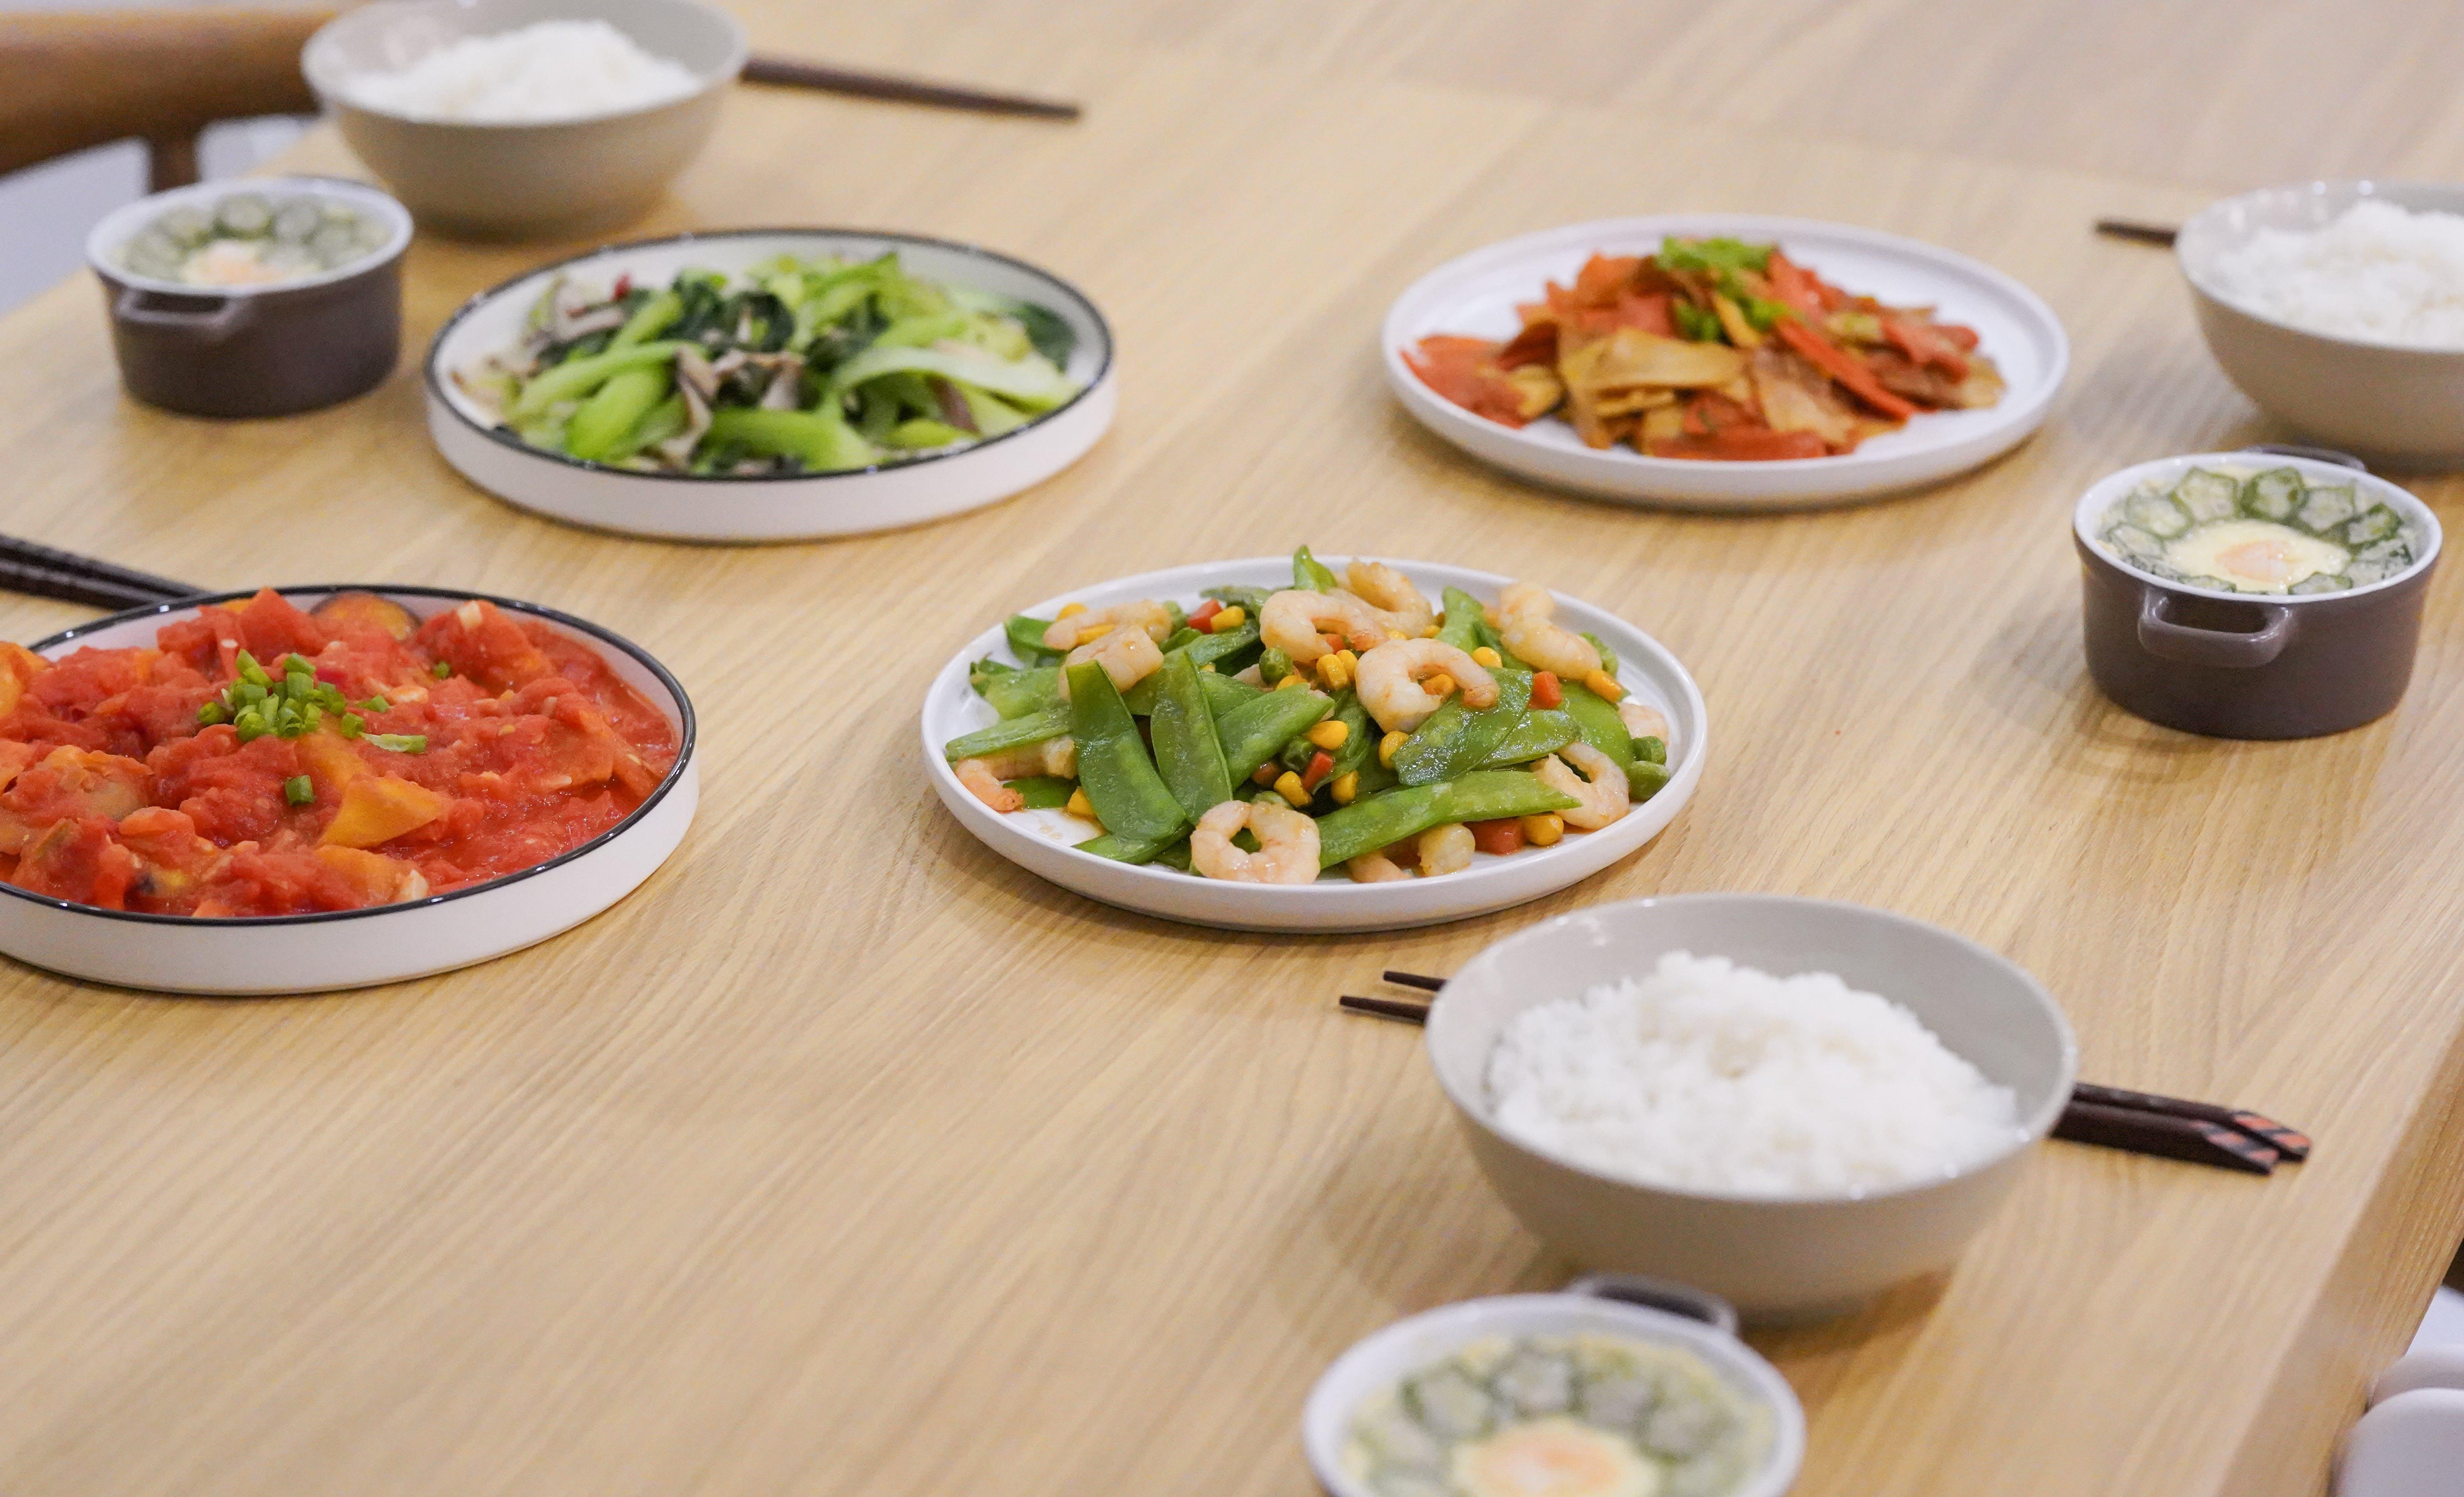 Fotos de stock gratuitas de almuerzo, arroz, bol, carne